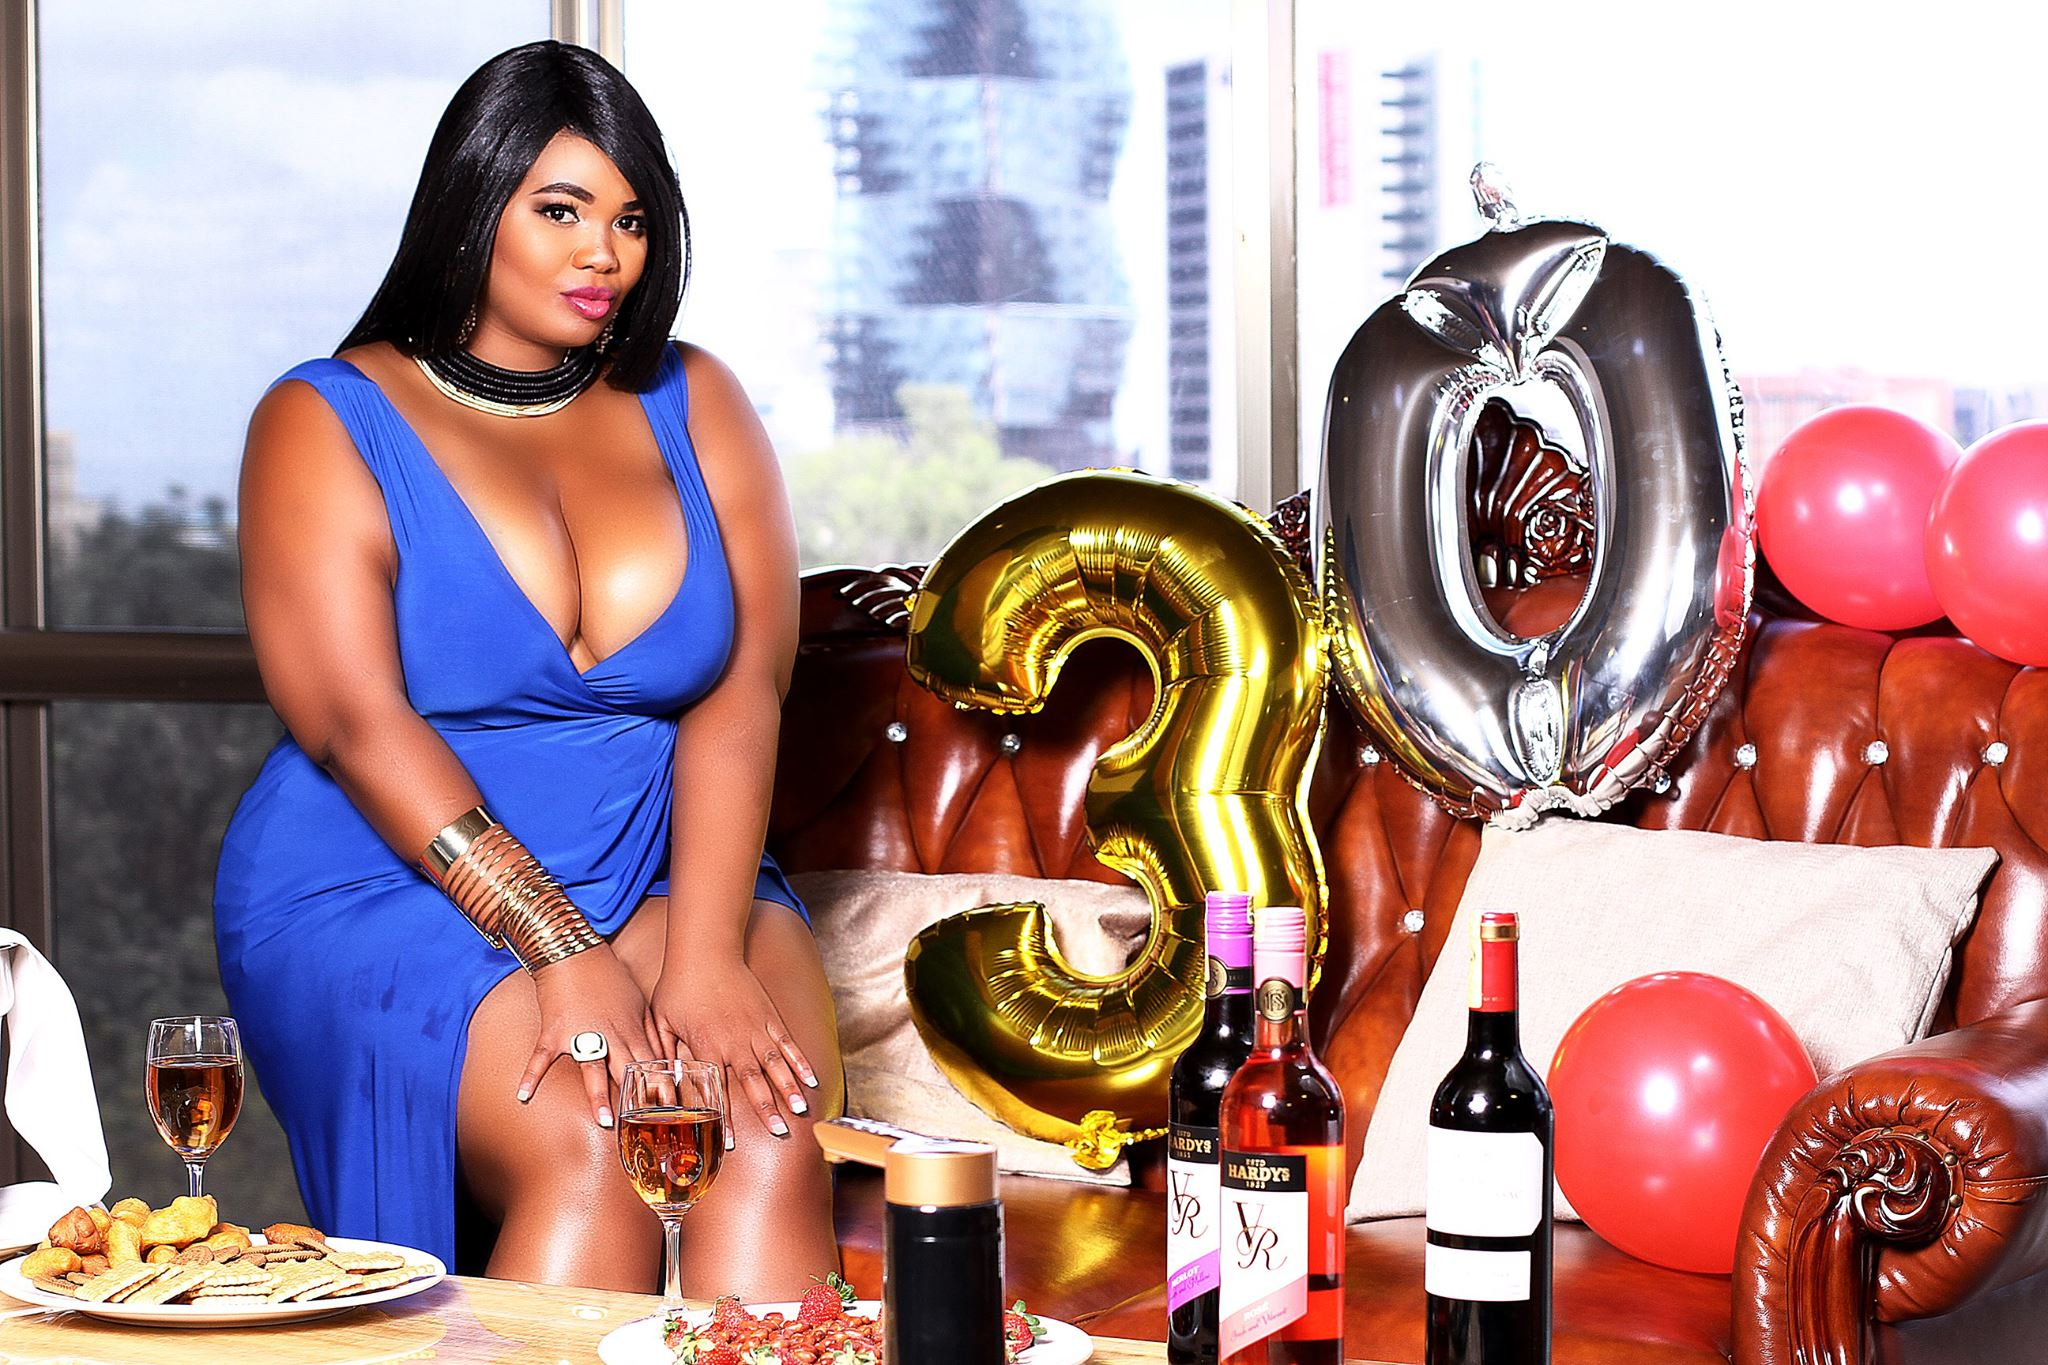 Neomi Nganga celebrating her 30th birthday in Bangkok, Thailand. photo credit: Instagram/neominganga